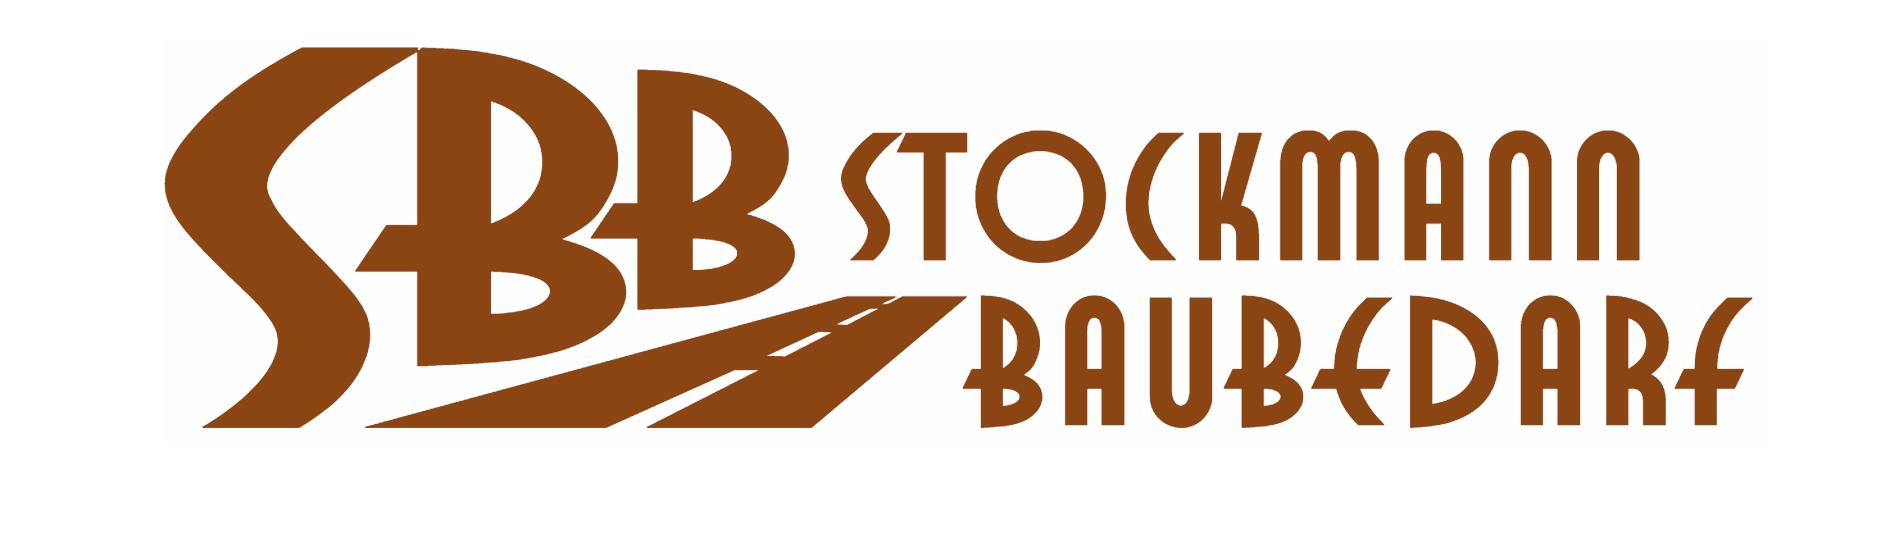 SBB Stockmann